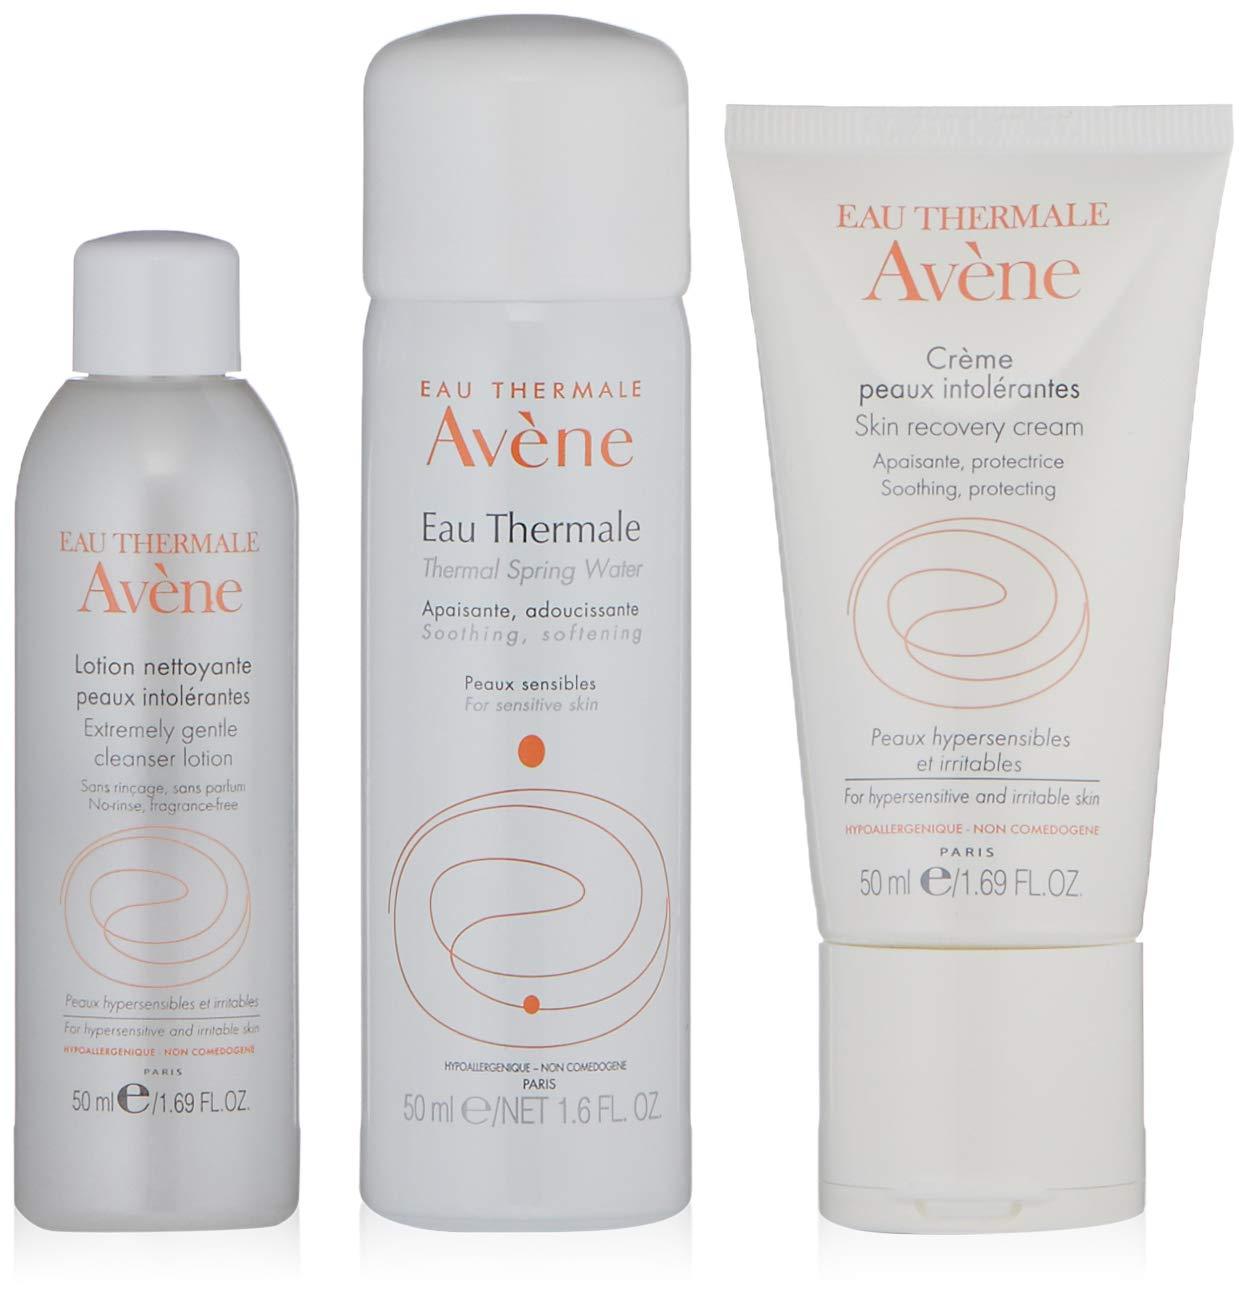 Eau Thermale Avene Hypersensitive Skin Regimen Kit for Sensitive and Irritated Skin by Eau Thermale Avène